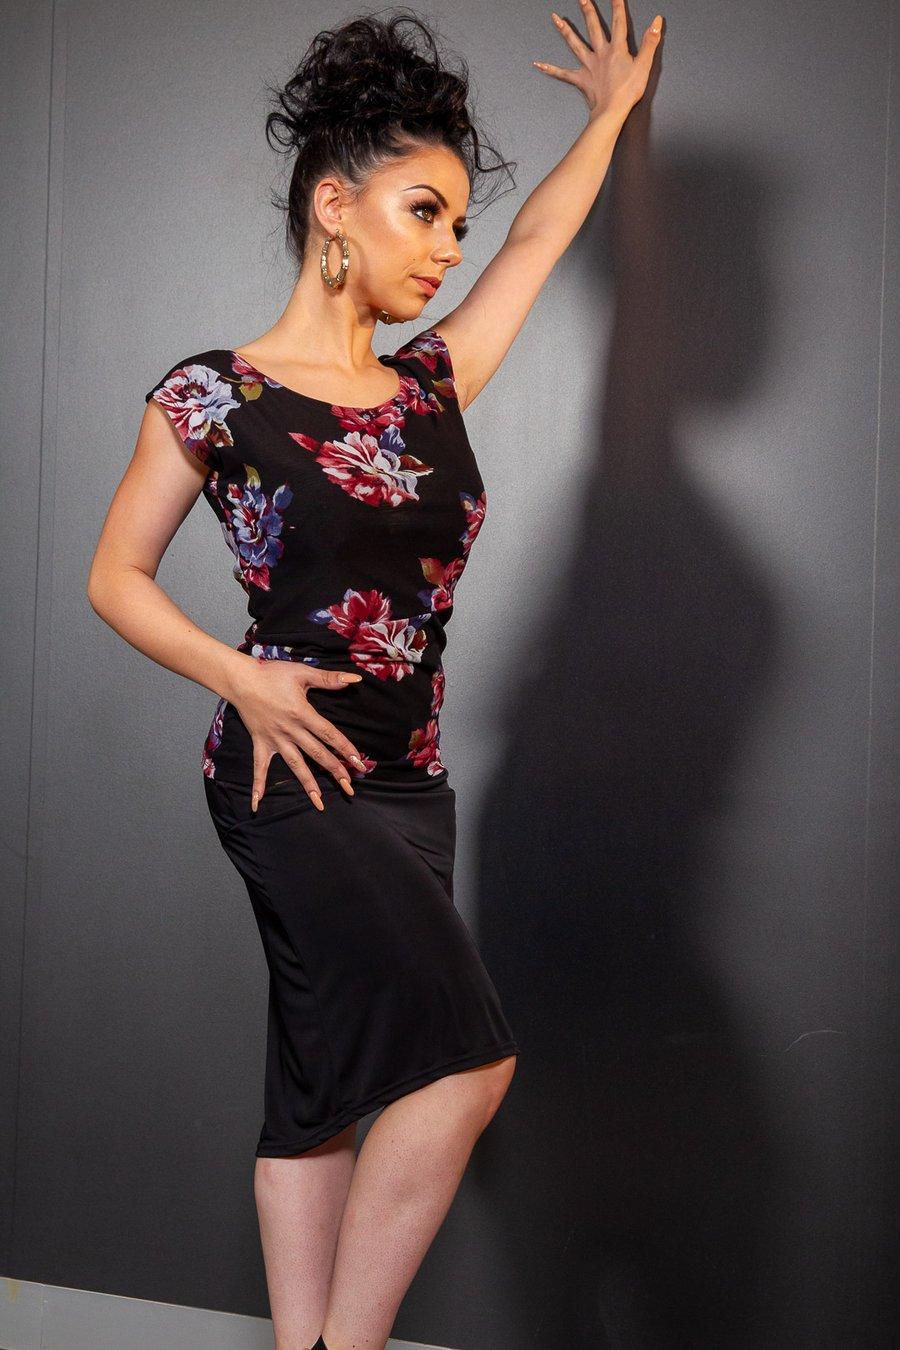 Image of Yulette Top (E7152/E17152) Camellia Dancewear latin ballroom